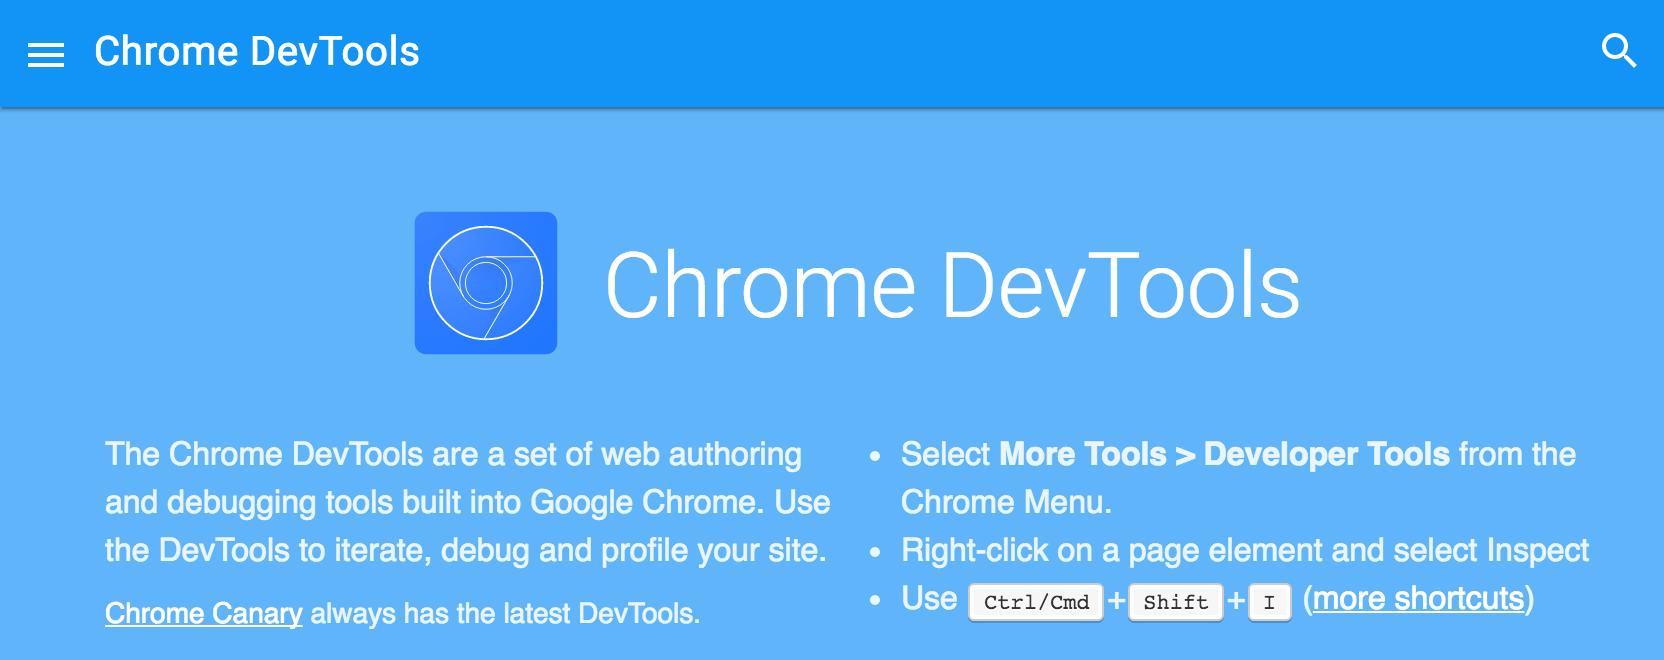 Use Chrome DevTools Profiler and Timeline